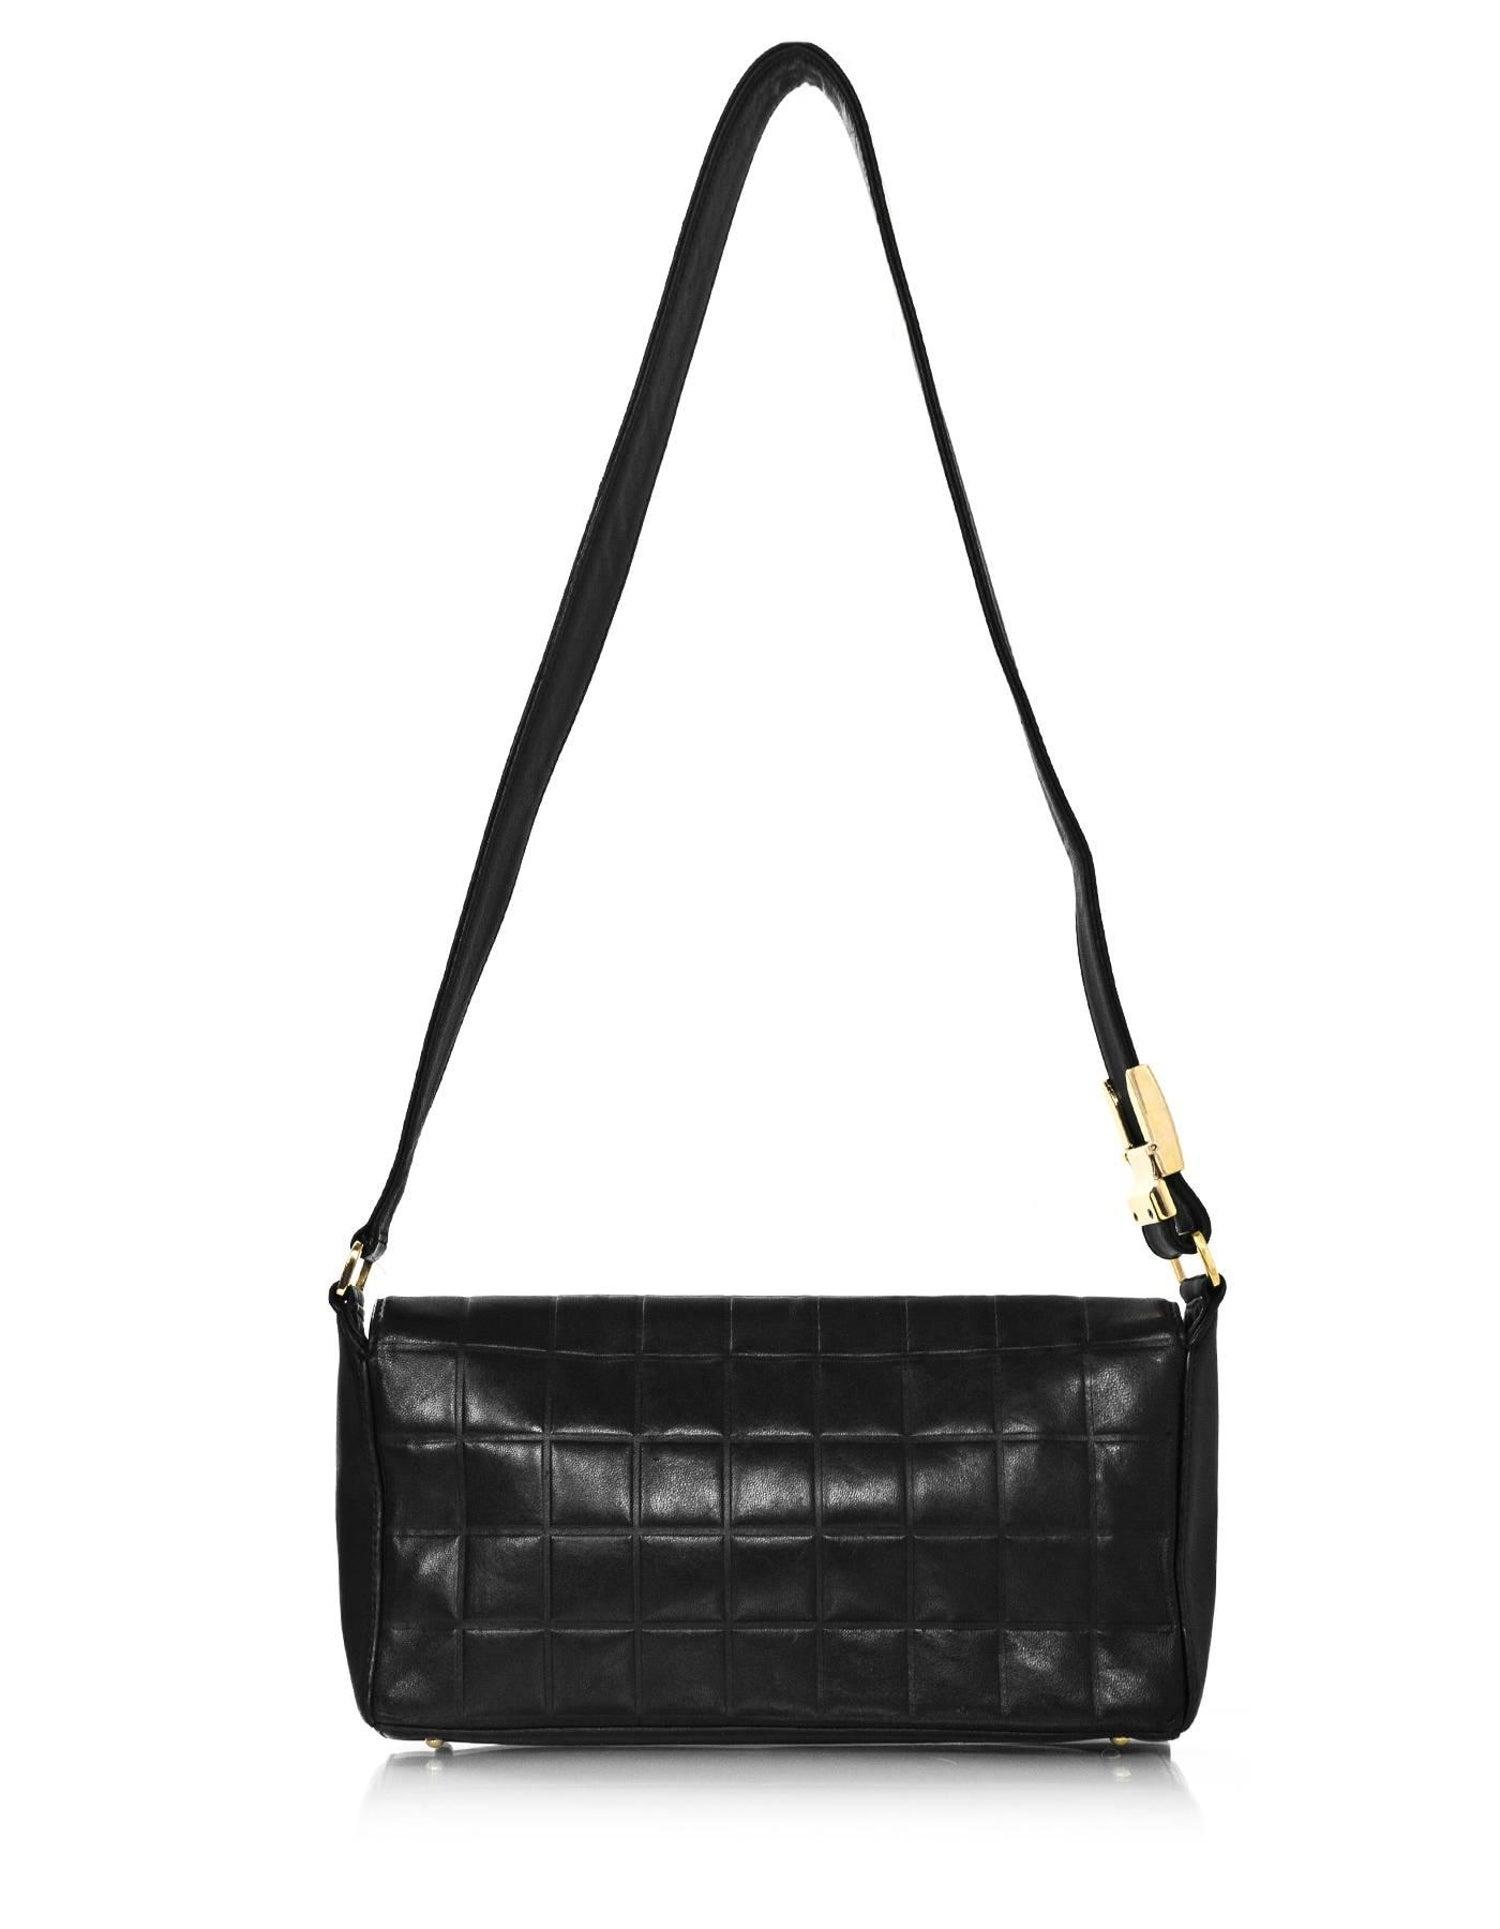 37d570447523fa Chanel Black Lambskin Chocolate Bar CC Pochette Bag For Sale at 1stdibs